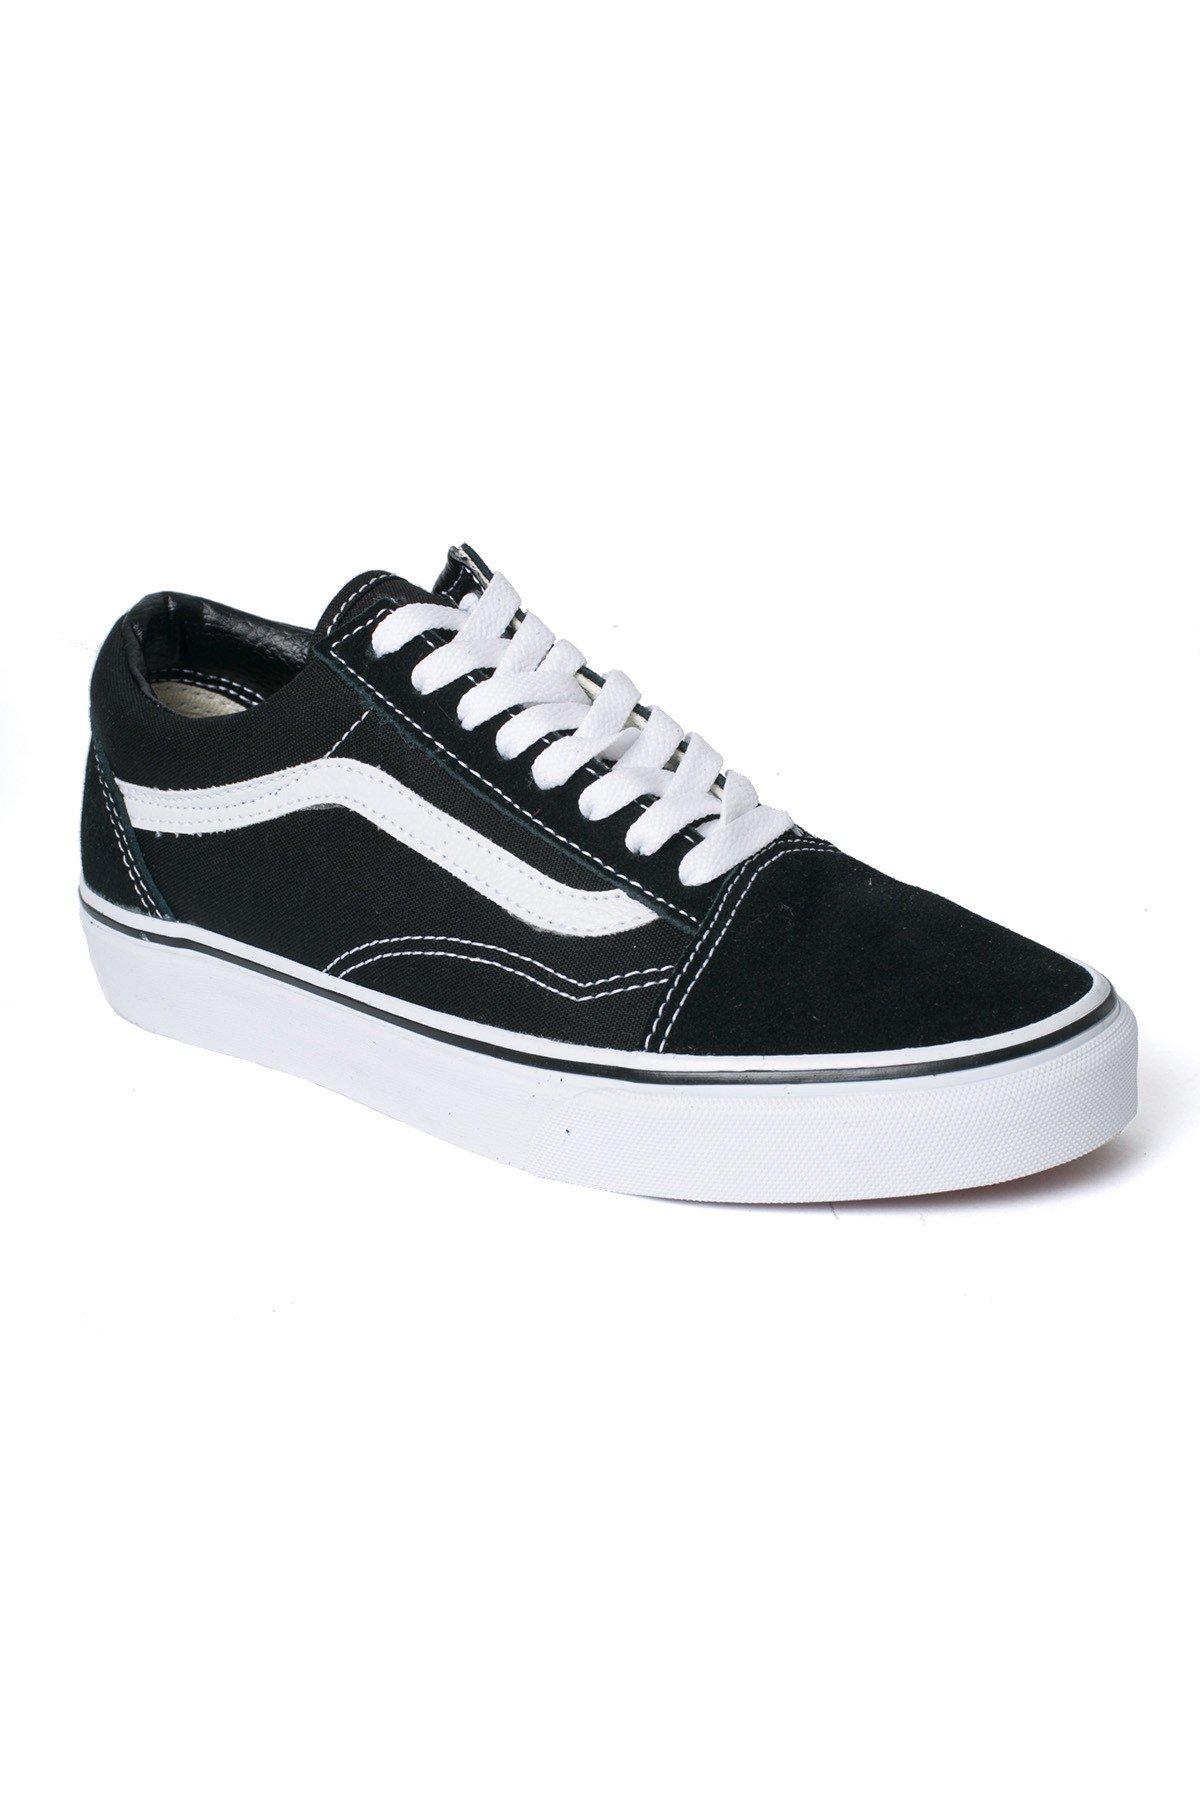 Vans Old Skool Black White Skate VN-0D3HY28 Mens US 9